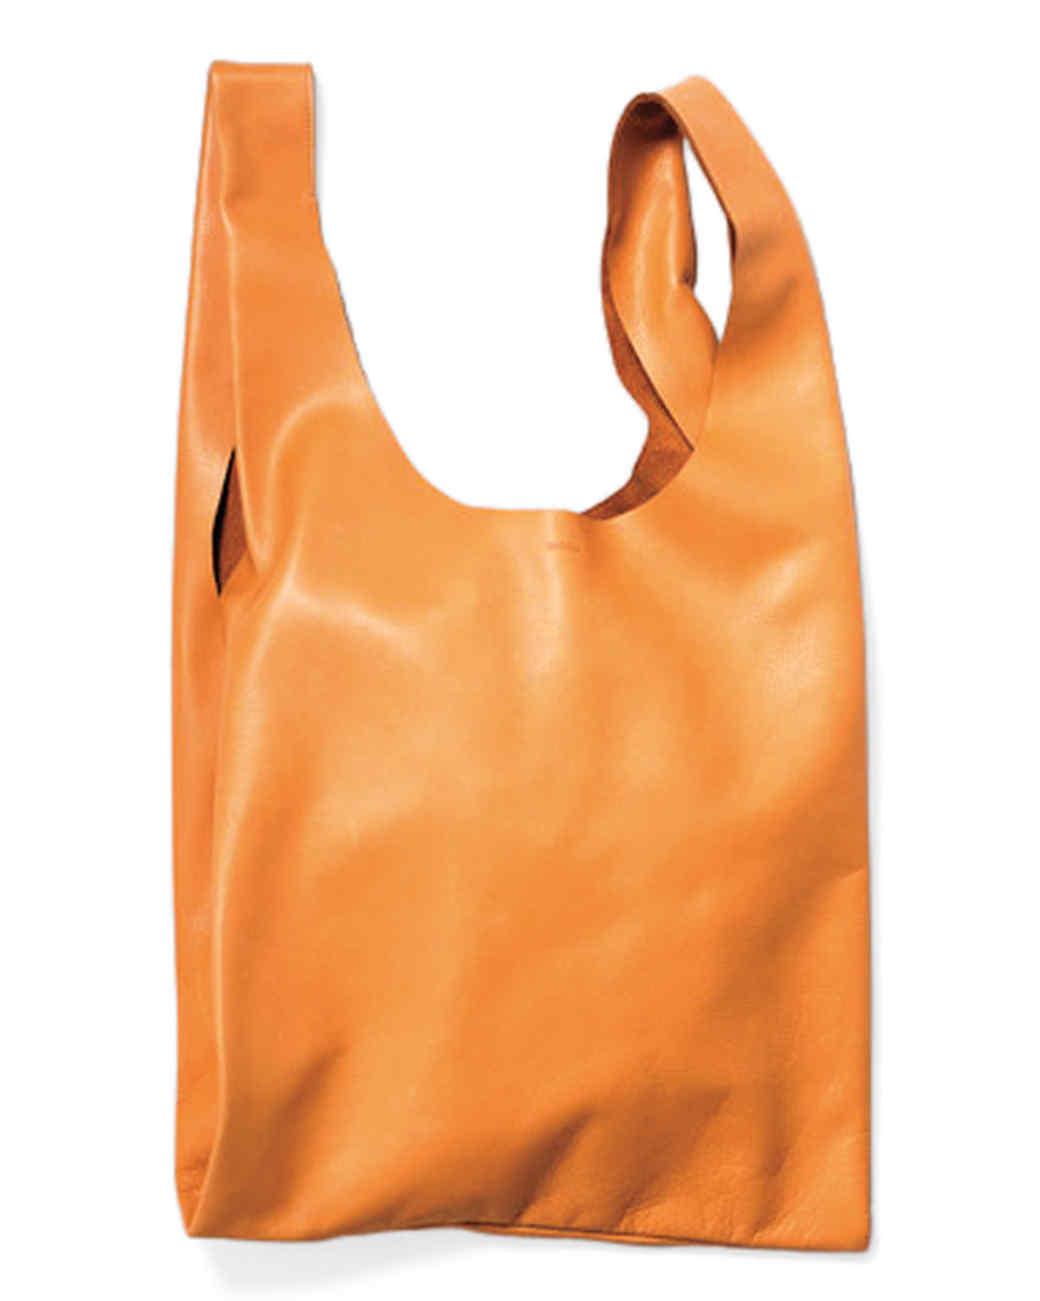 moms-leather-bag-ms108498.jpg